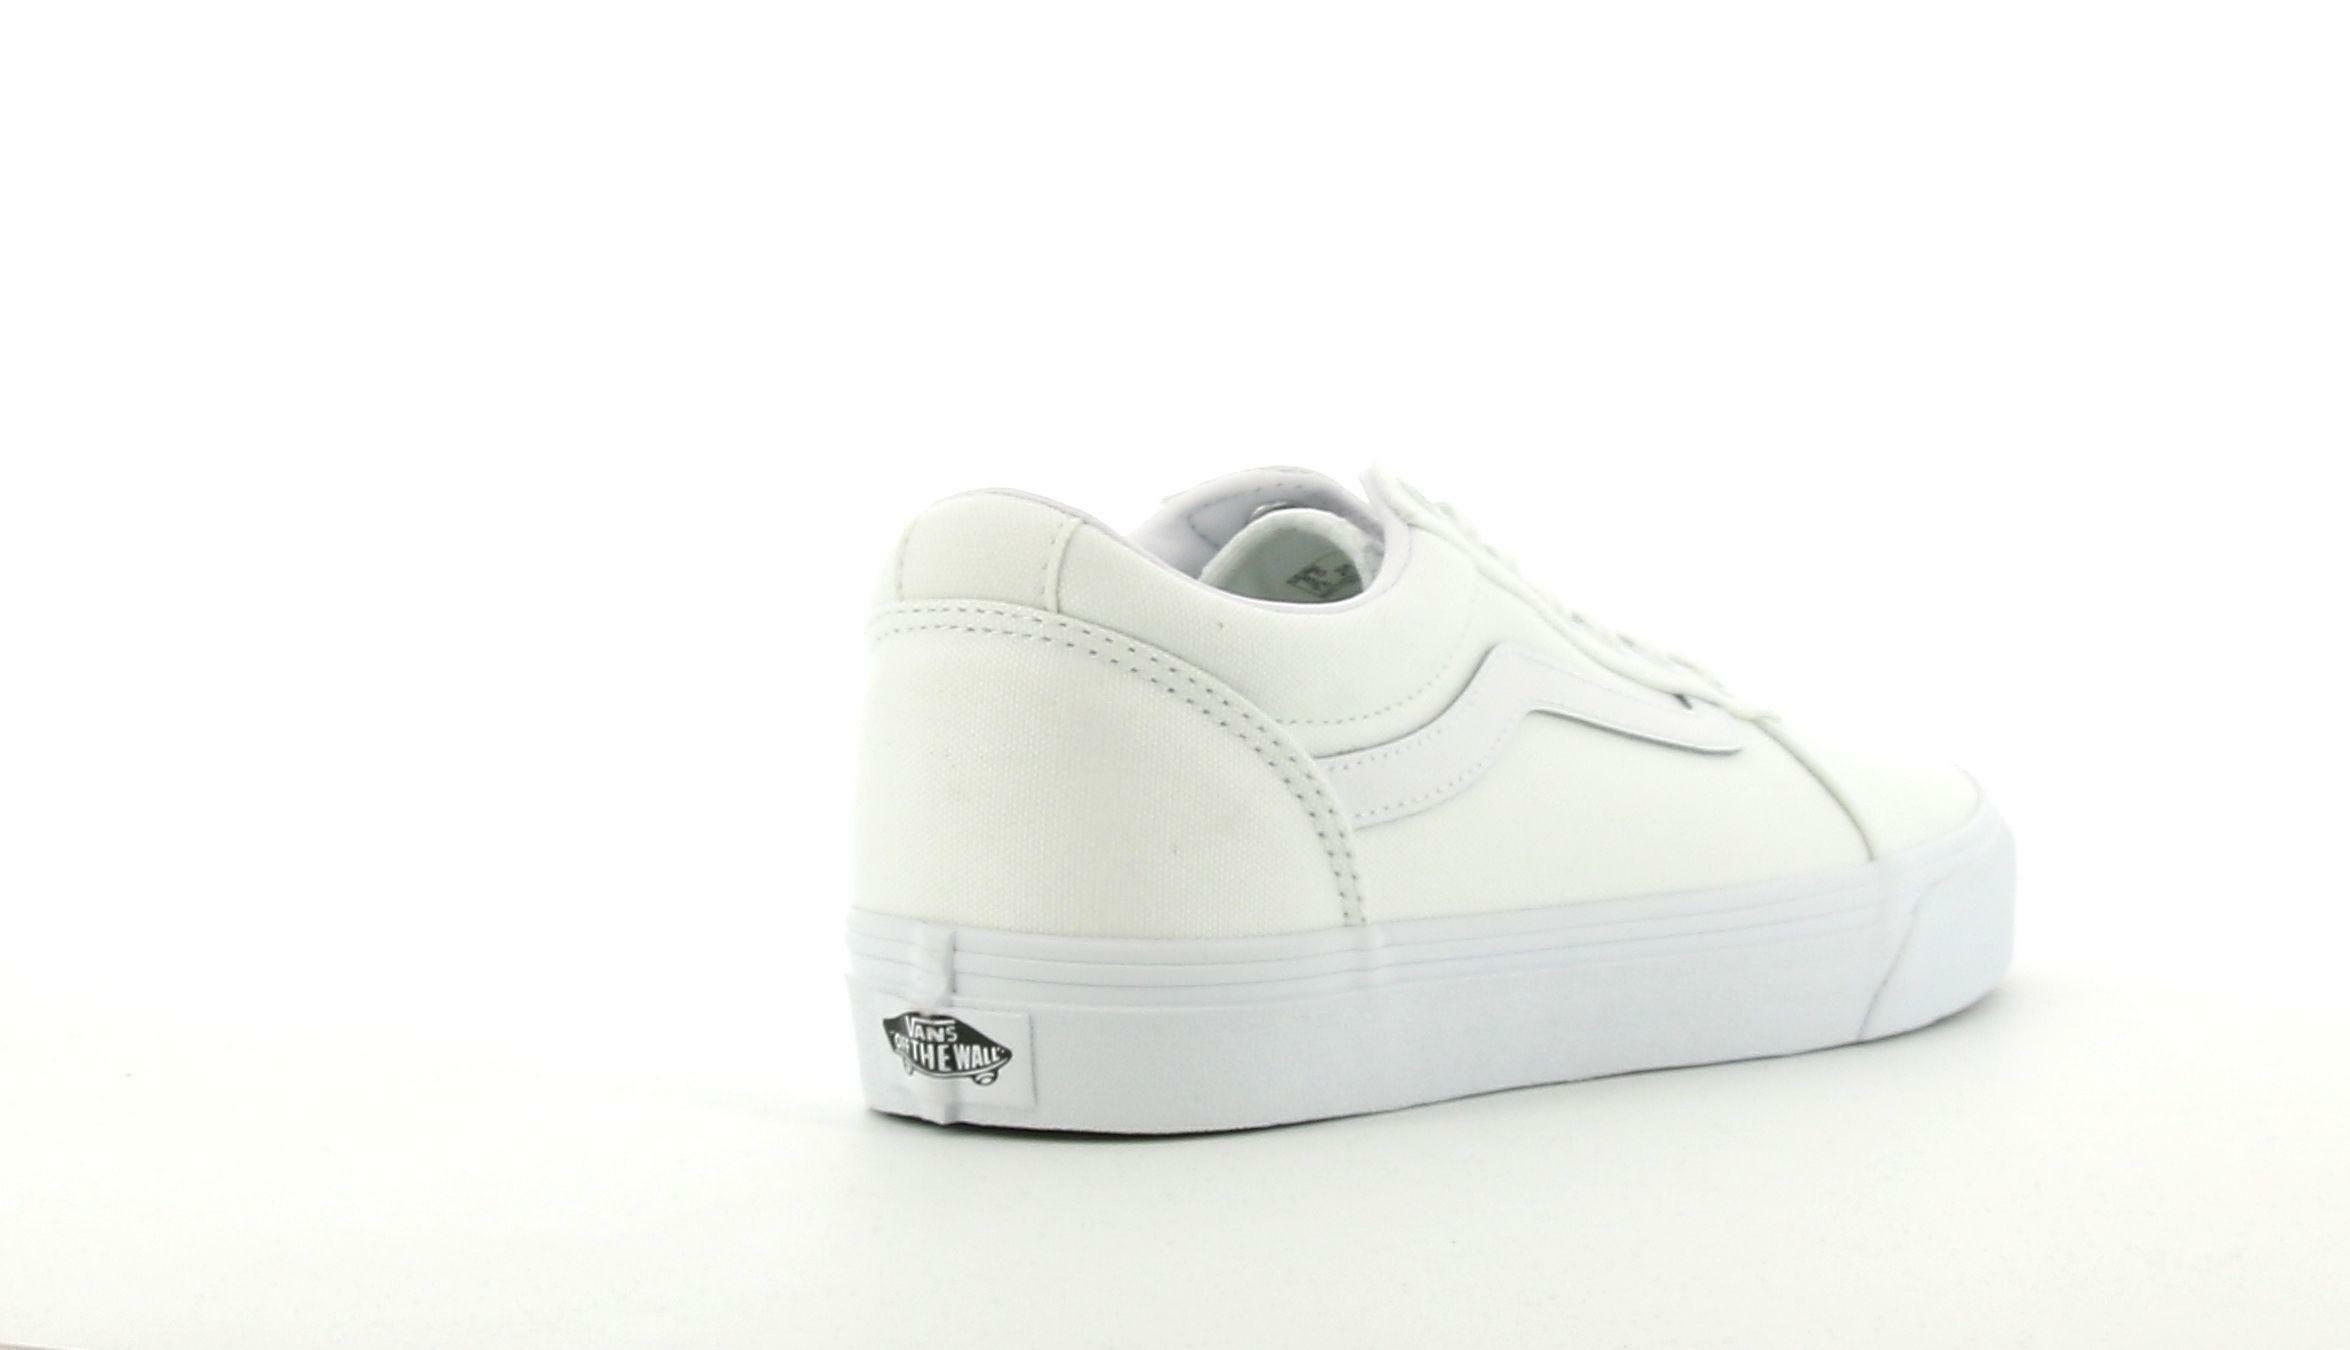 vans vans ward canvas vn0a38dm7hn1 sneaker uomo bianca